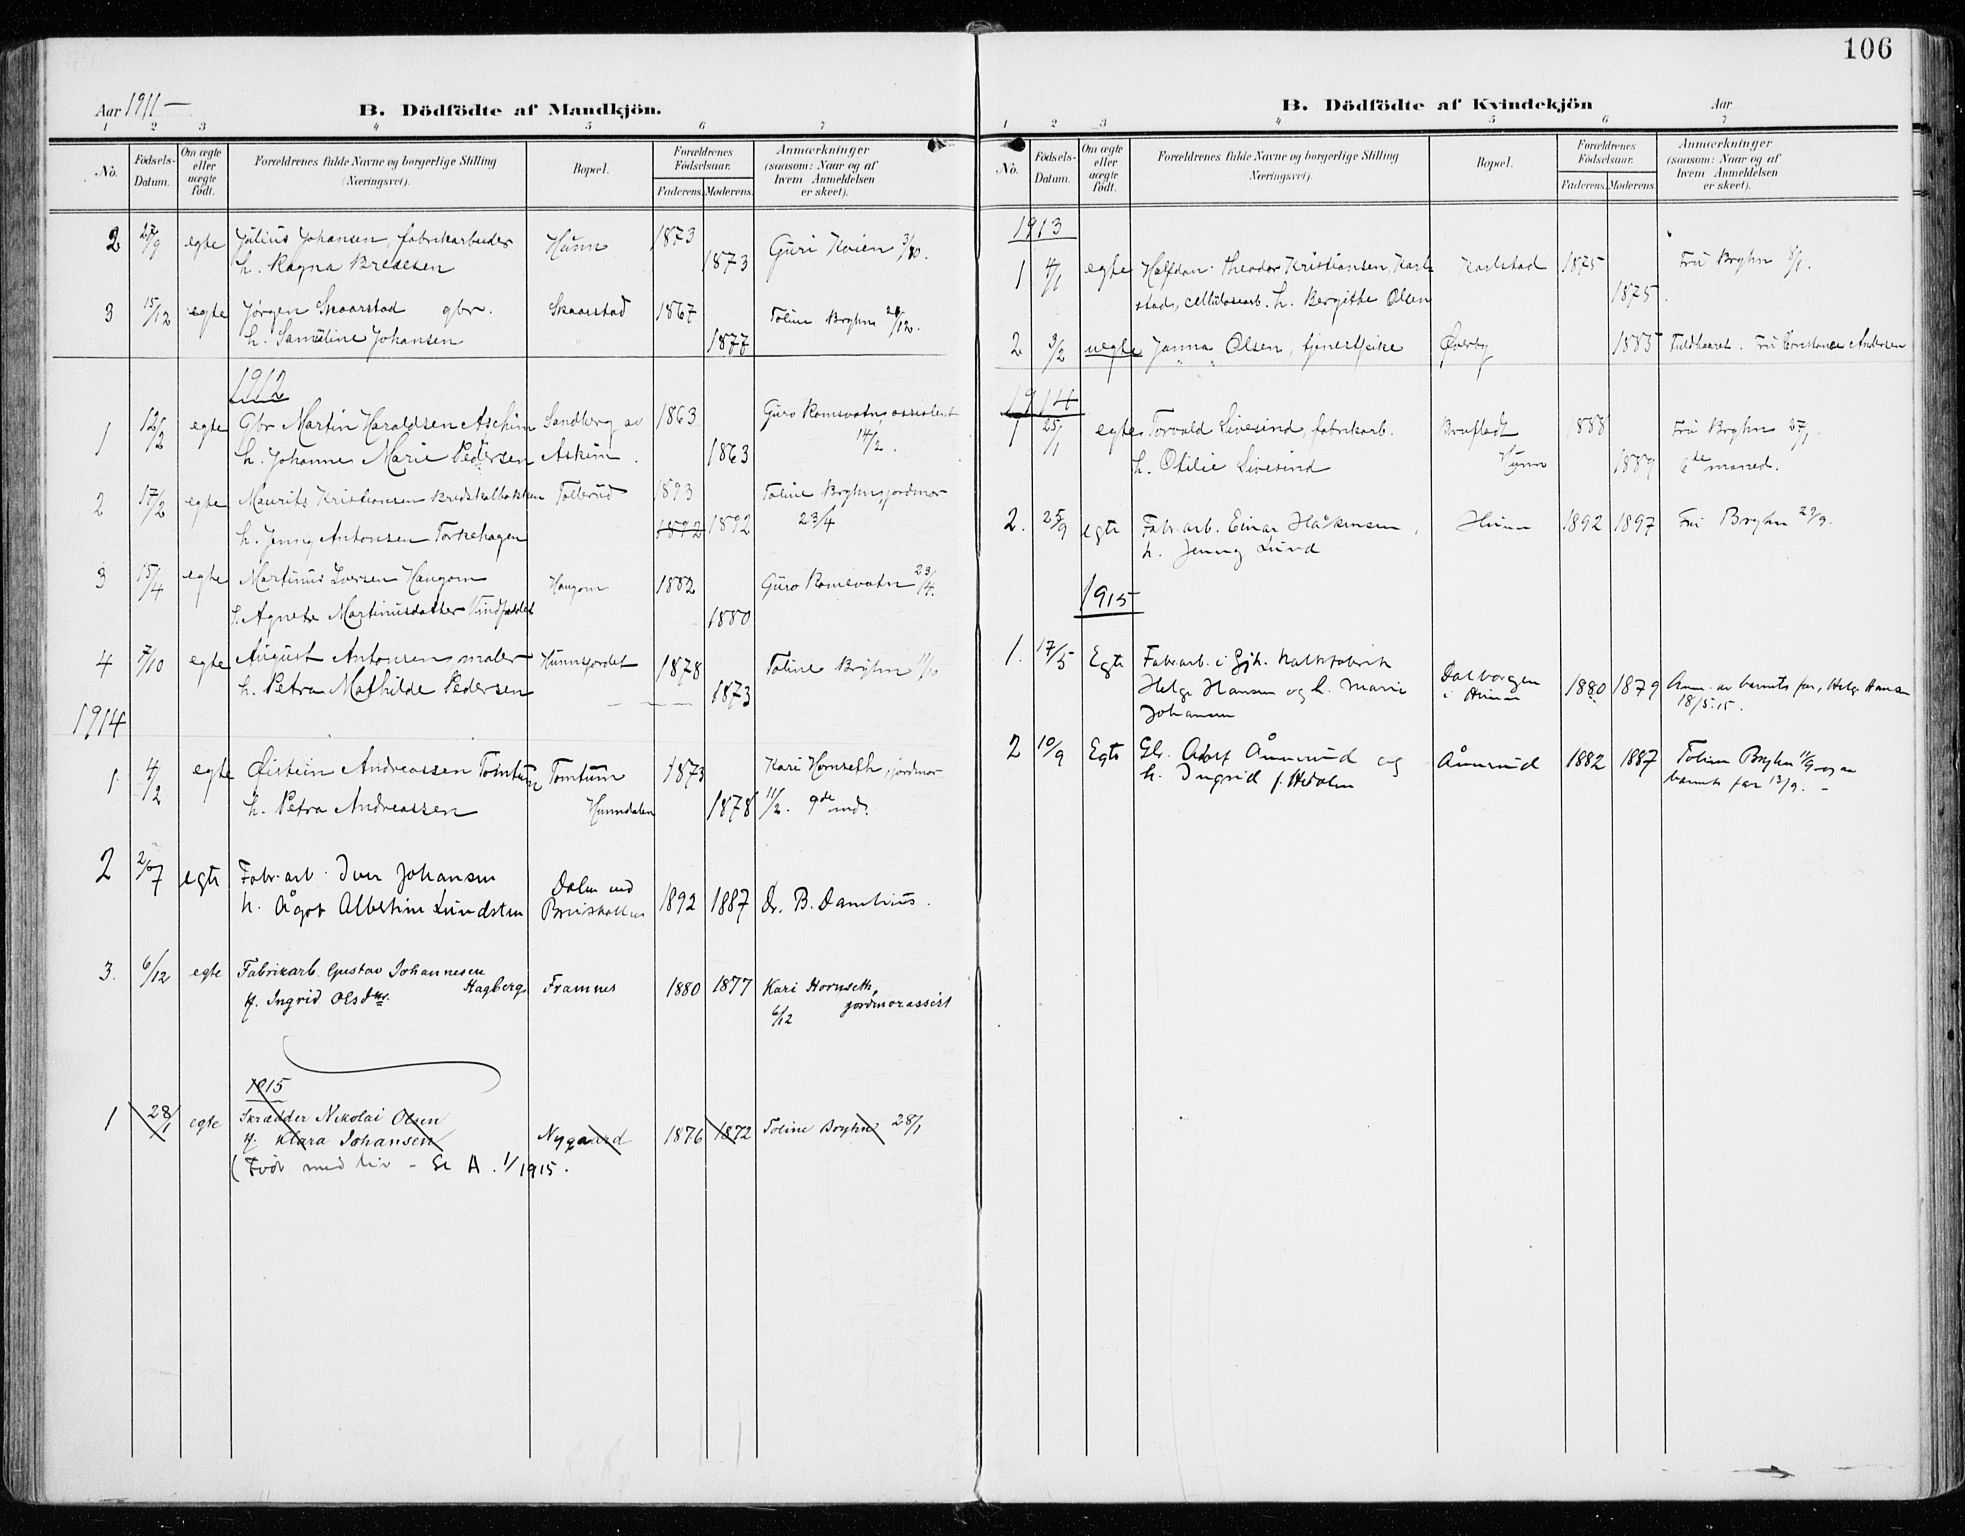 SAH, Vardal prestekontor, H/Ha/Haa/L0016: Ministerialbok nr. 16, 1904-1916, s. 106